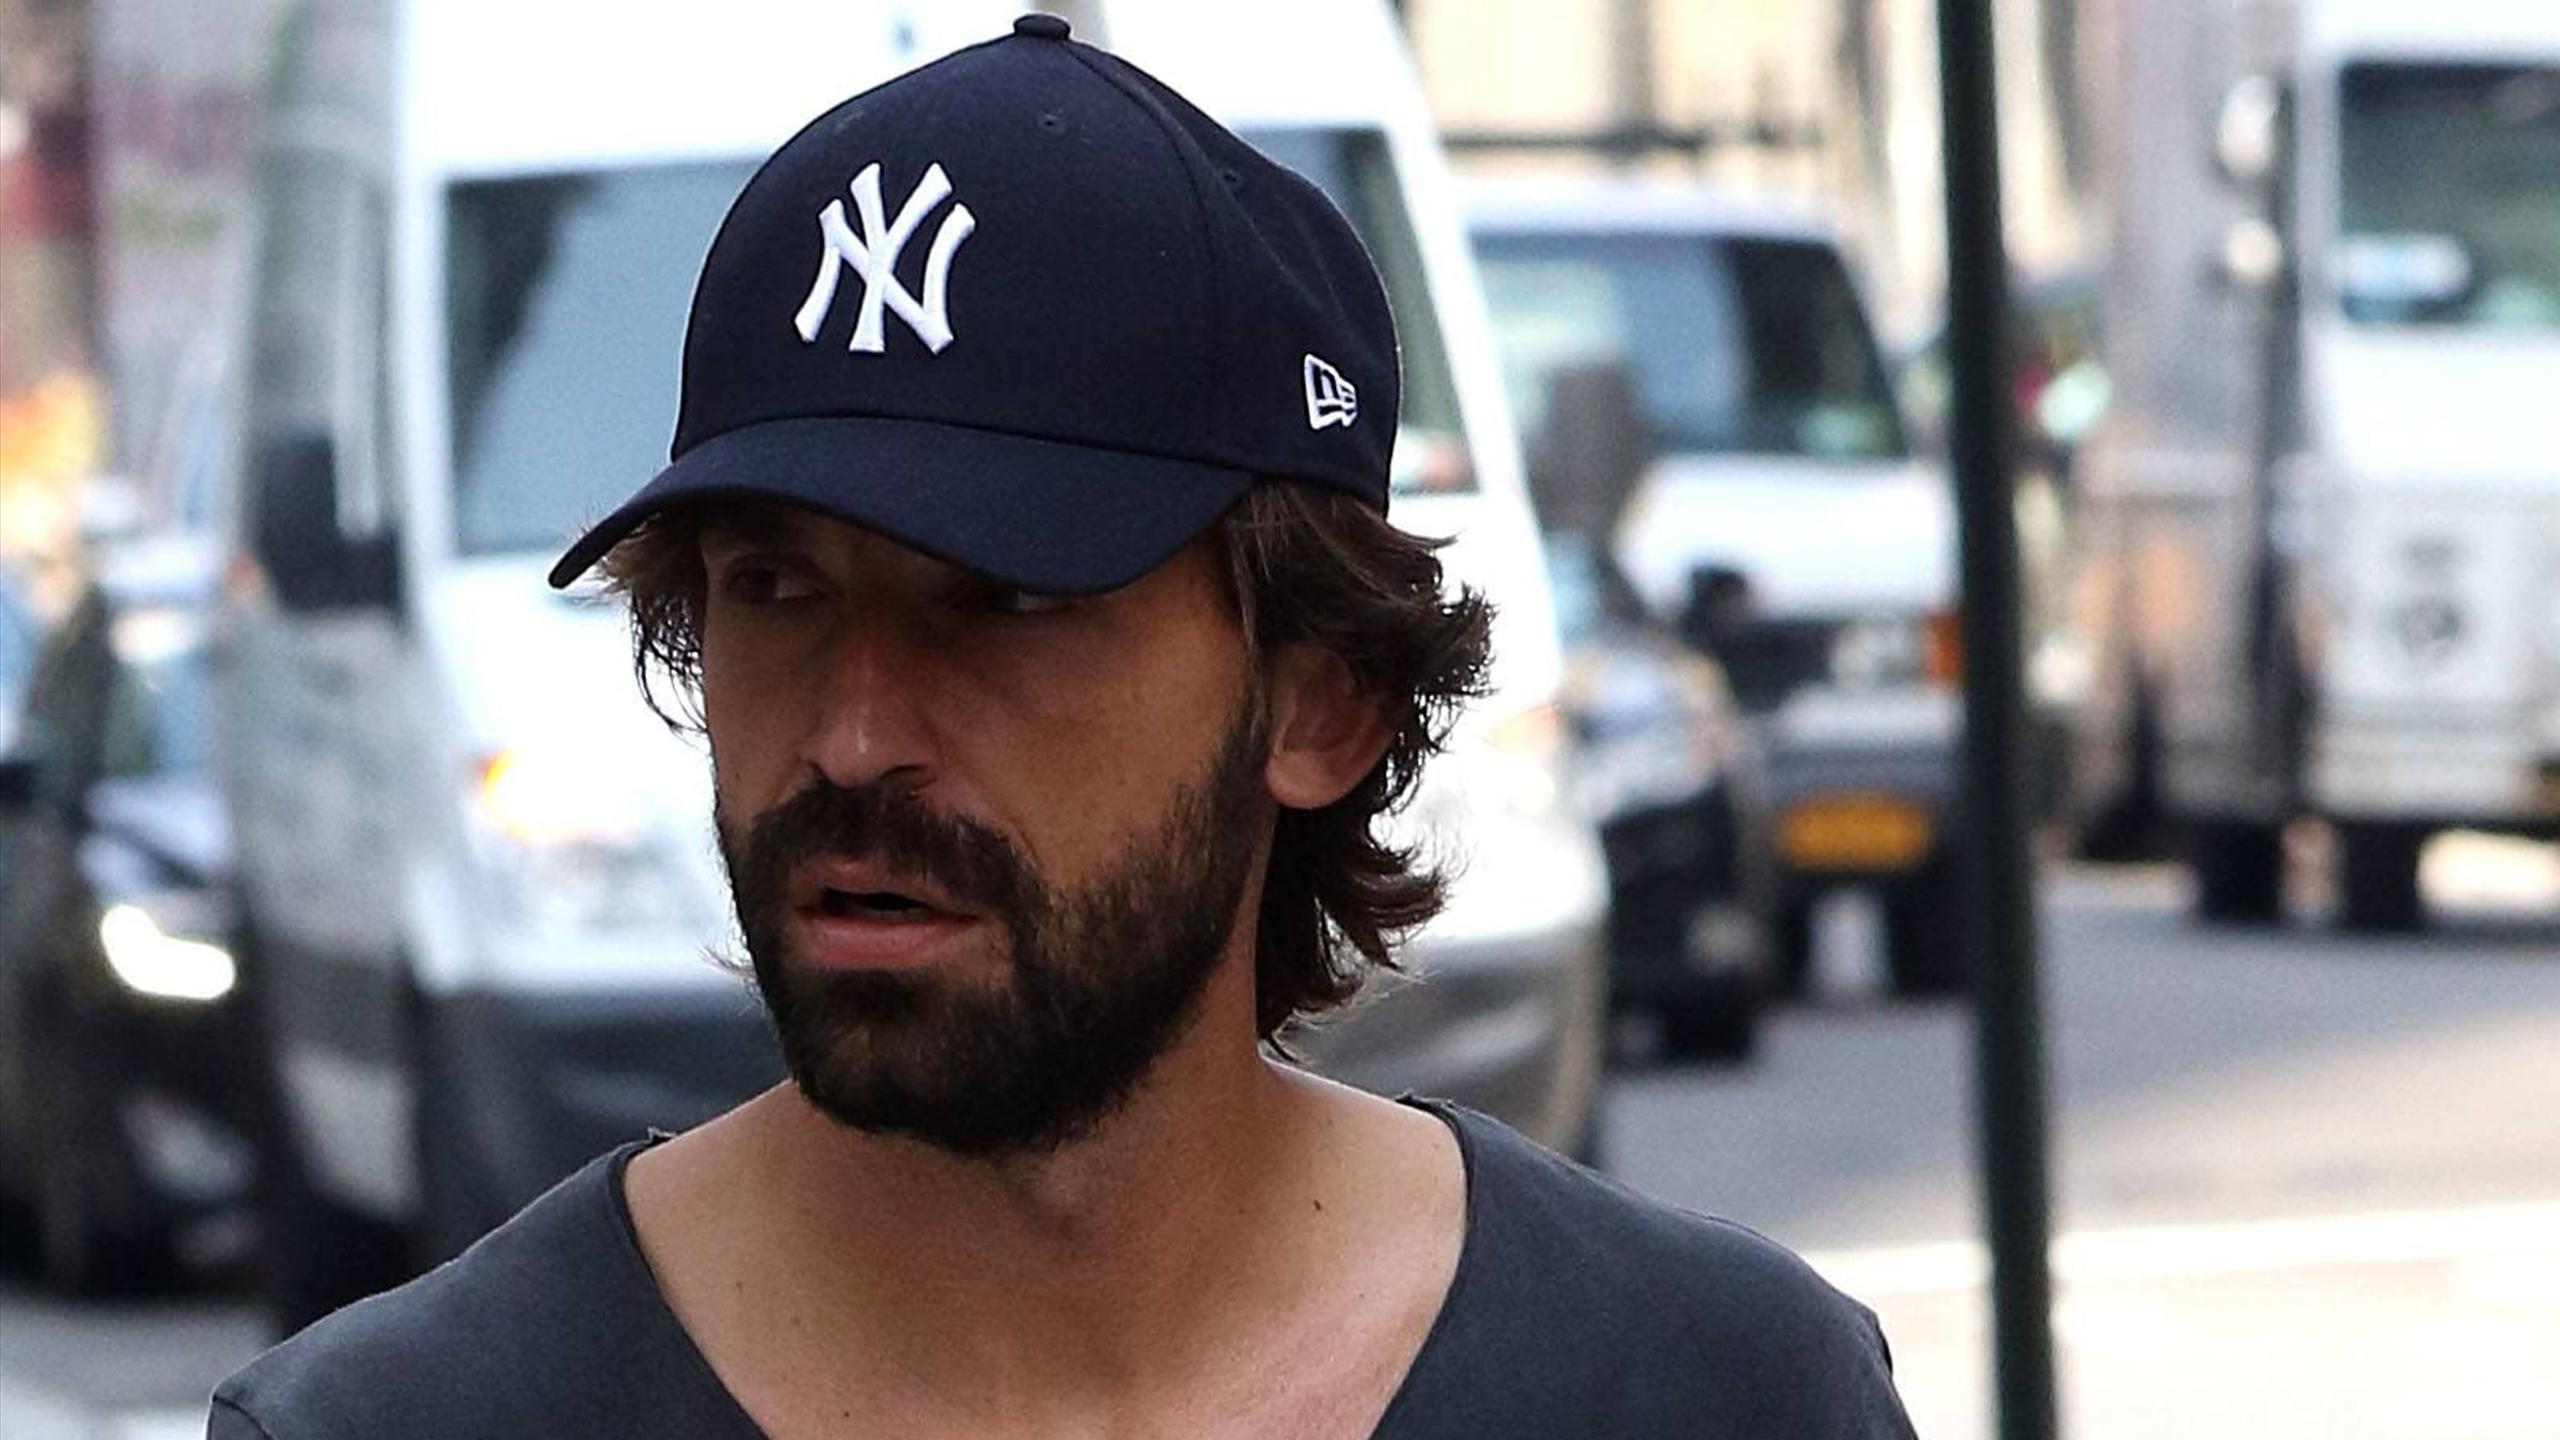 Andrea Pirlo in New York